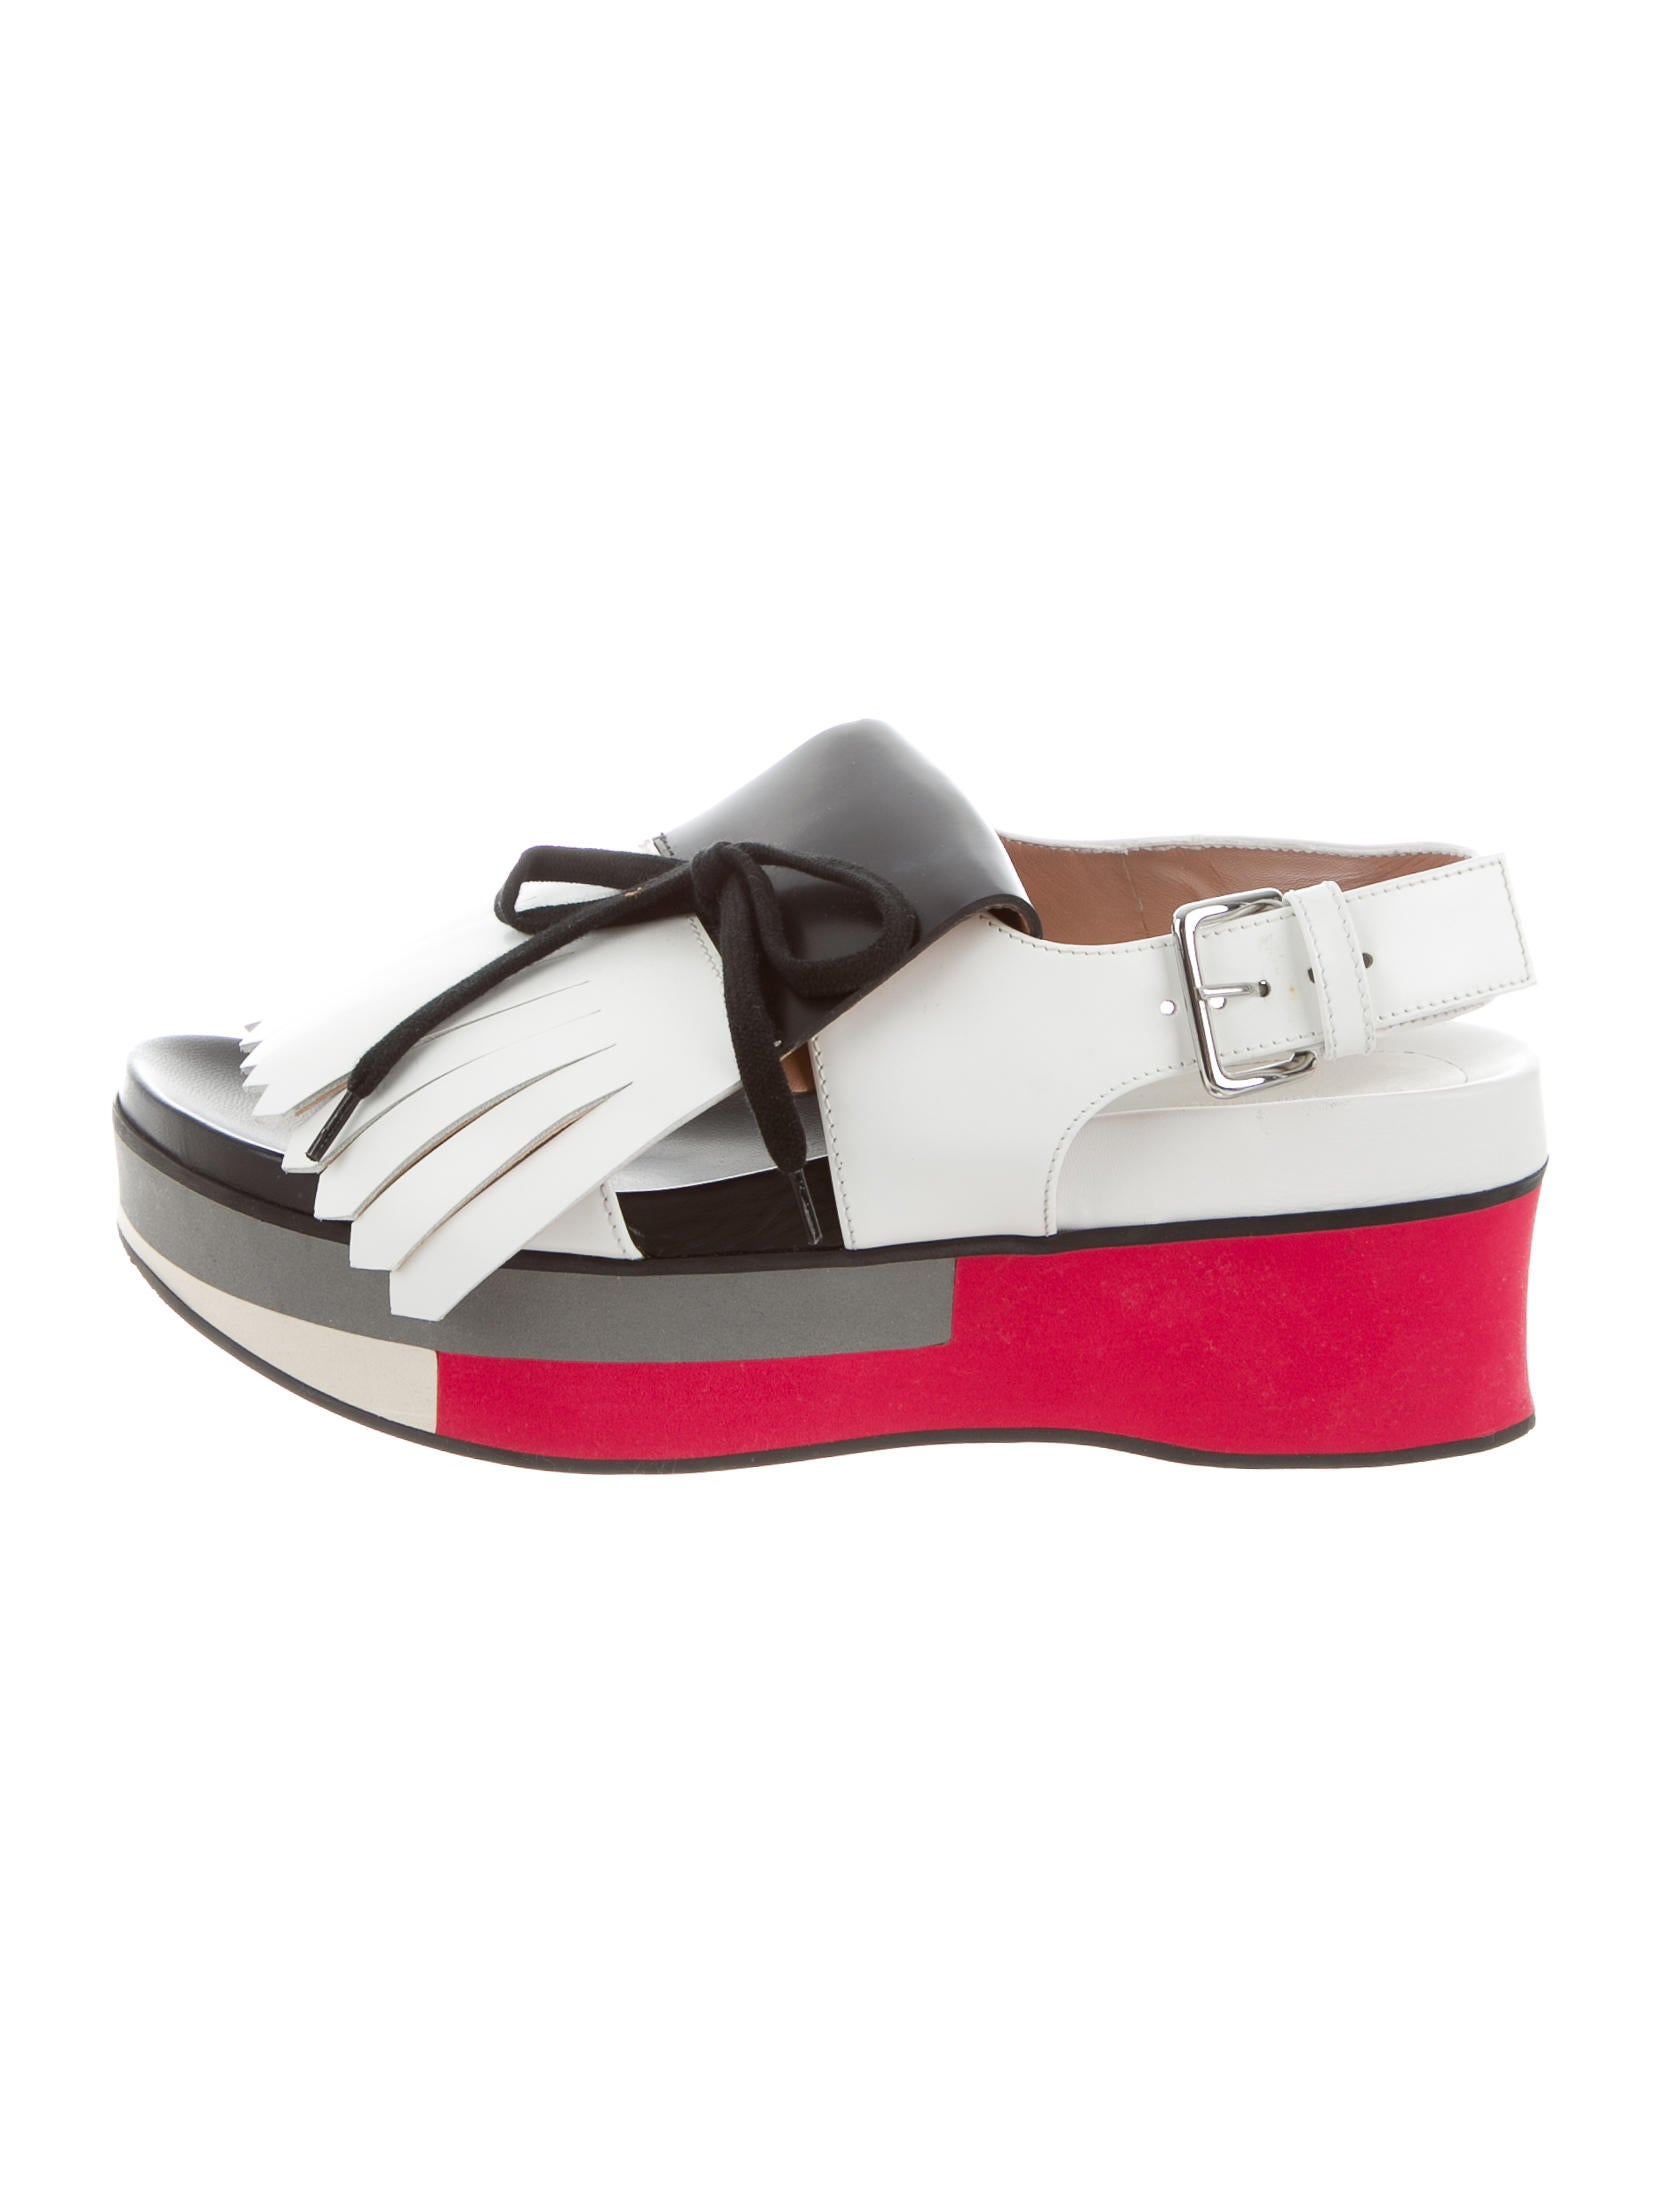 best prices sale online buy cheap low shipping Marni Kiltie-Accented Platform Sandals footlocker pictures online cheap online shop dG1U2R80Zr